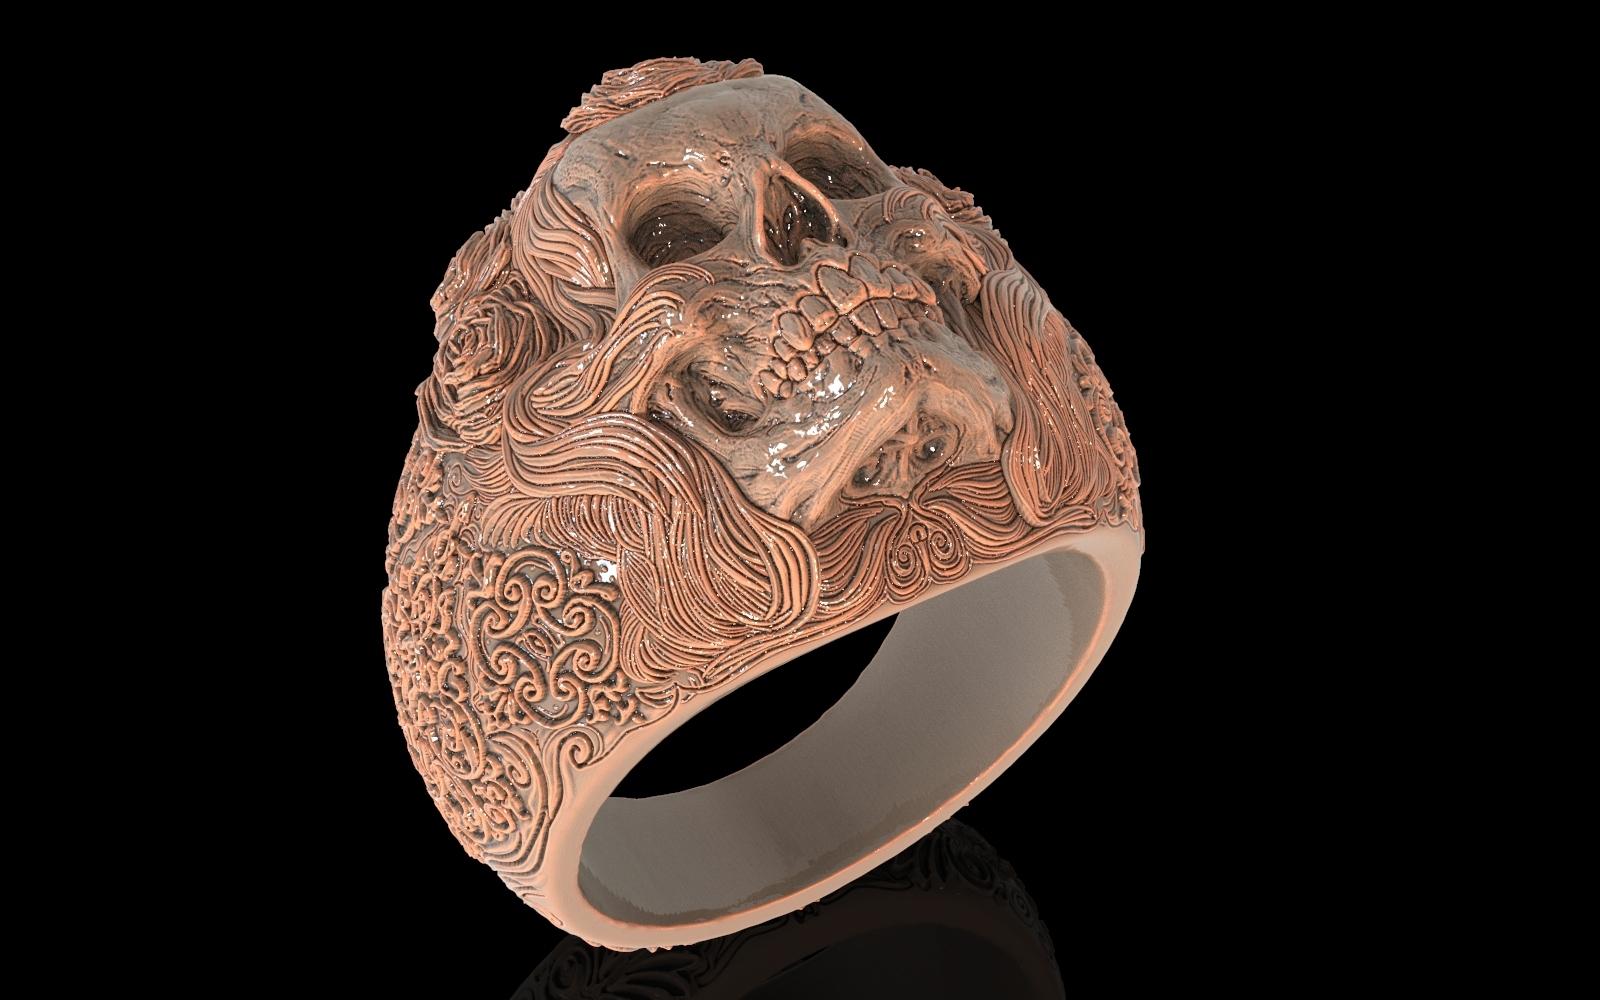 2.jpg Download free STL file Skull ring jewelry skeleton ring 3D print model • 3D print object, Cadagency